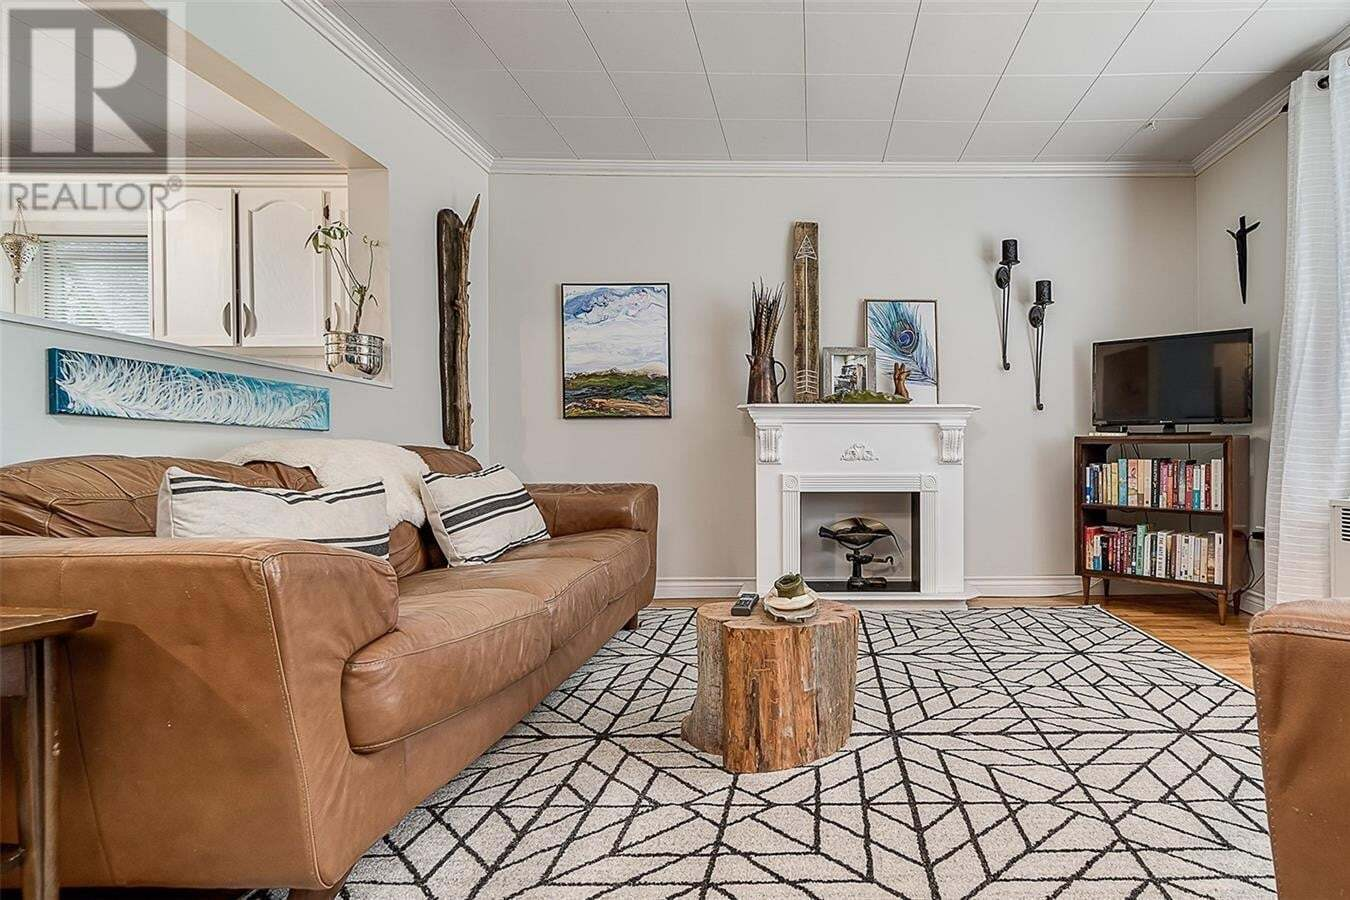 House for sale at 541 Hochelaga St E Moose Jaw Saskatchewan - MLS: SK811660